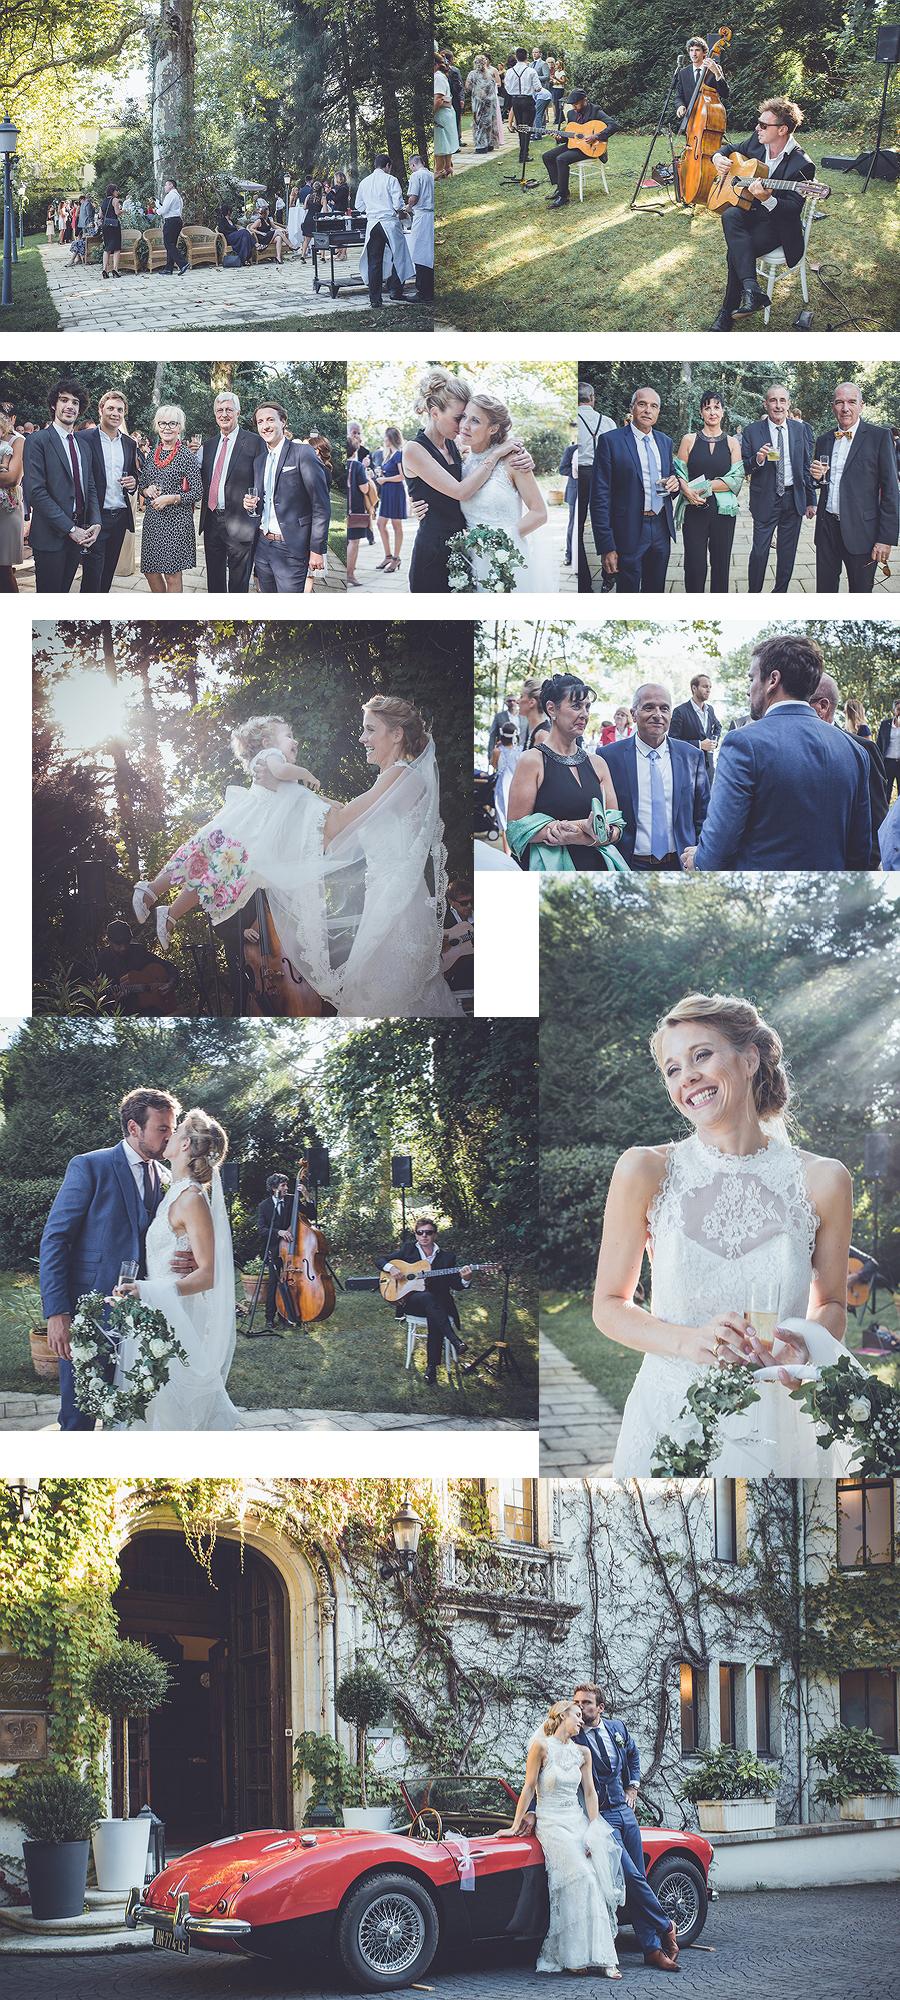 Isabelle-palé-photographe-mariage-anglet-biarritz-chateau-brindos-bayonne-pays-basque-wedding-photographer-gatsby_2017-06